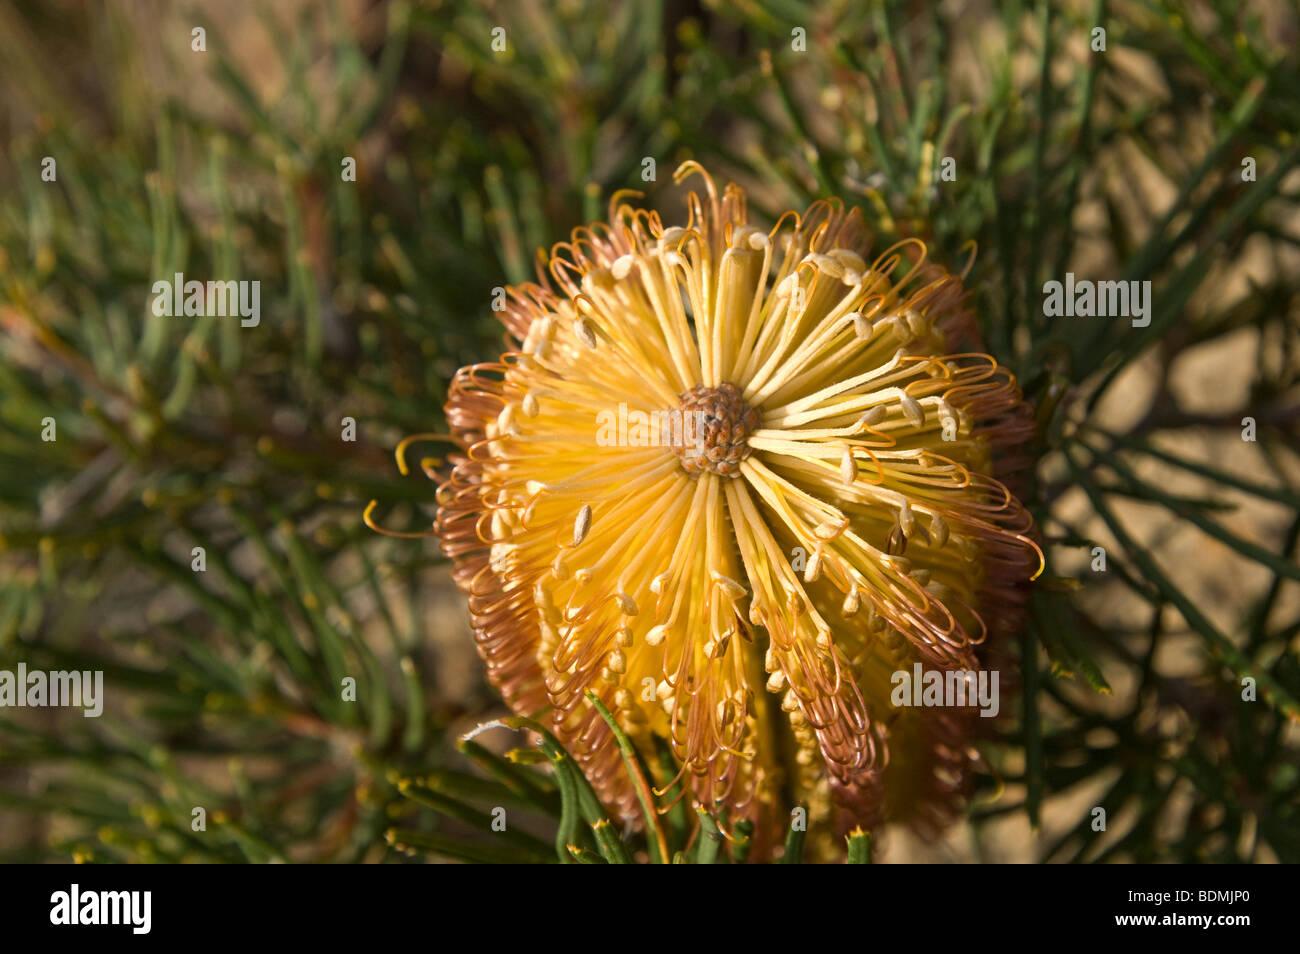 Heath Banksia flower (Banksia ericifolia), Blue Mountains National Park, New South Wales, Australia - Stock Image